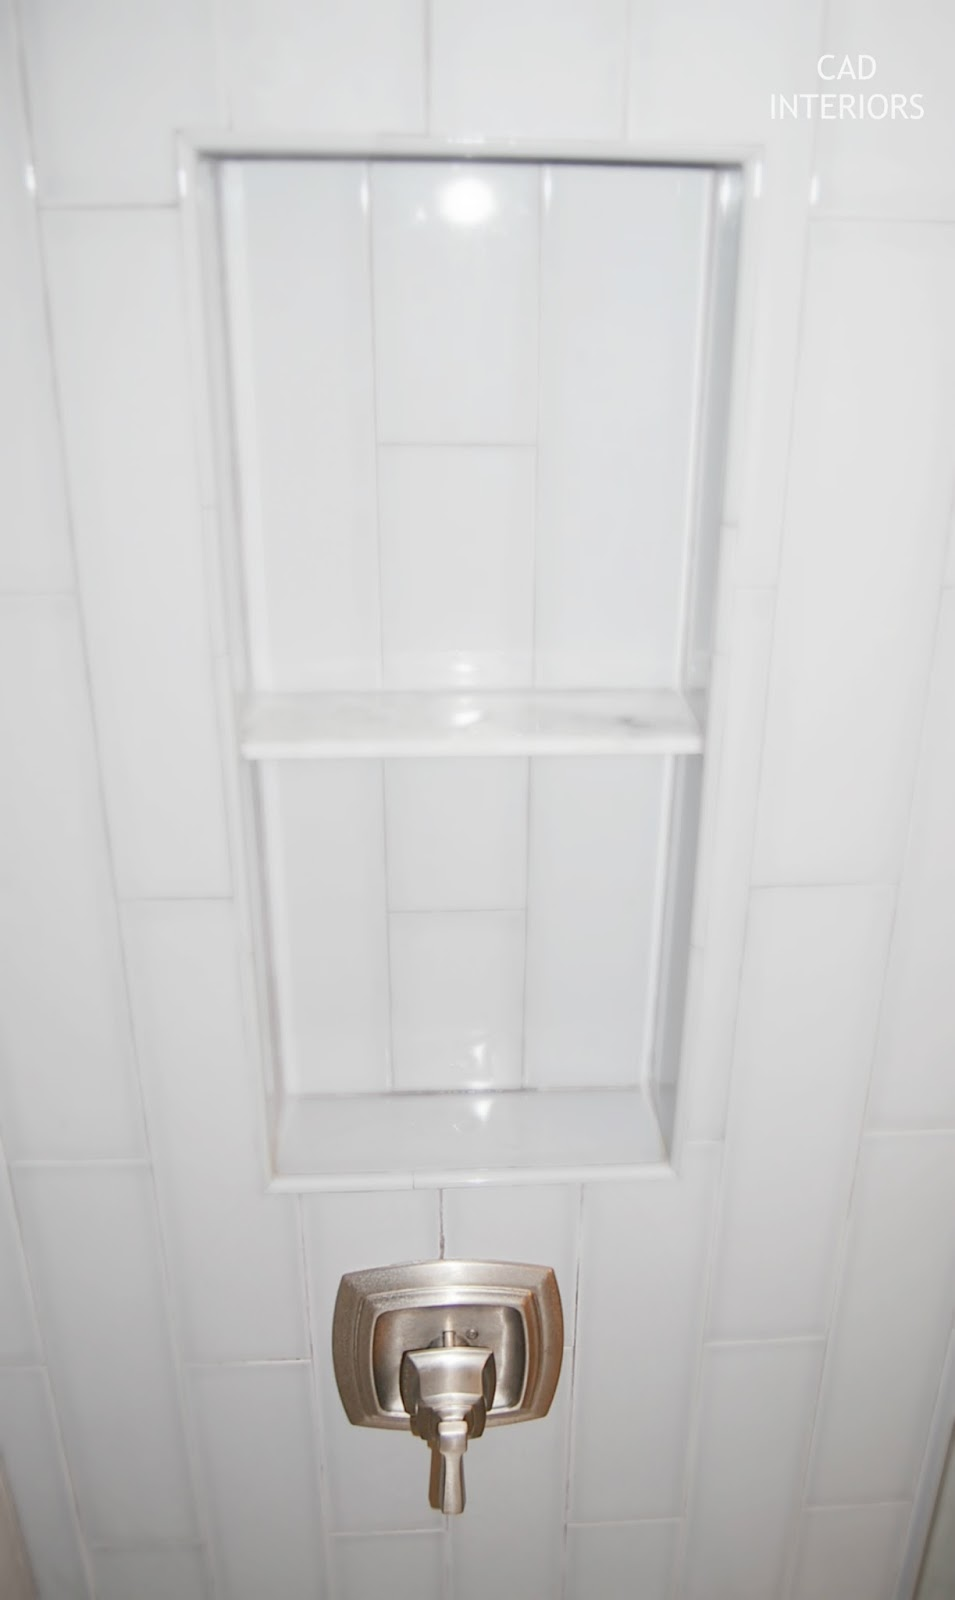 Cad interiors affordable stylish interiors cad interiors main bathroom renovation 4x16 denim porcelain tile vertical subway pattern brushed nickel bath fixtures dailygadgetfo Images